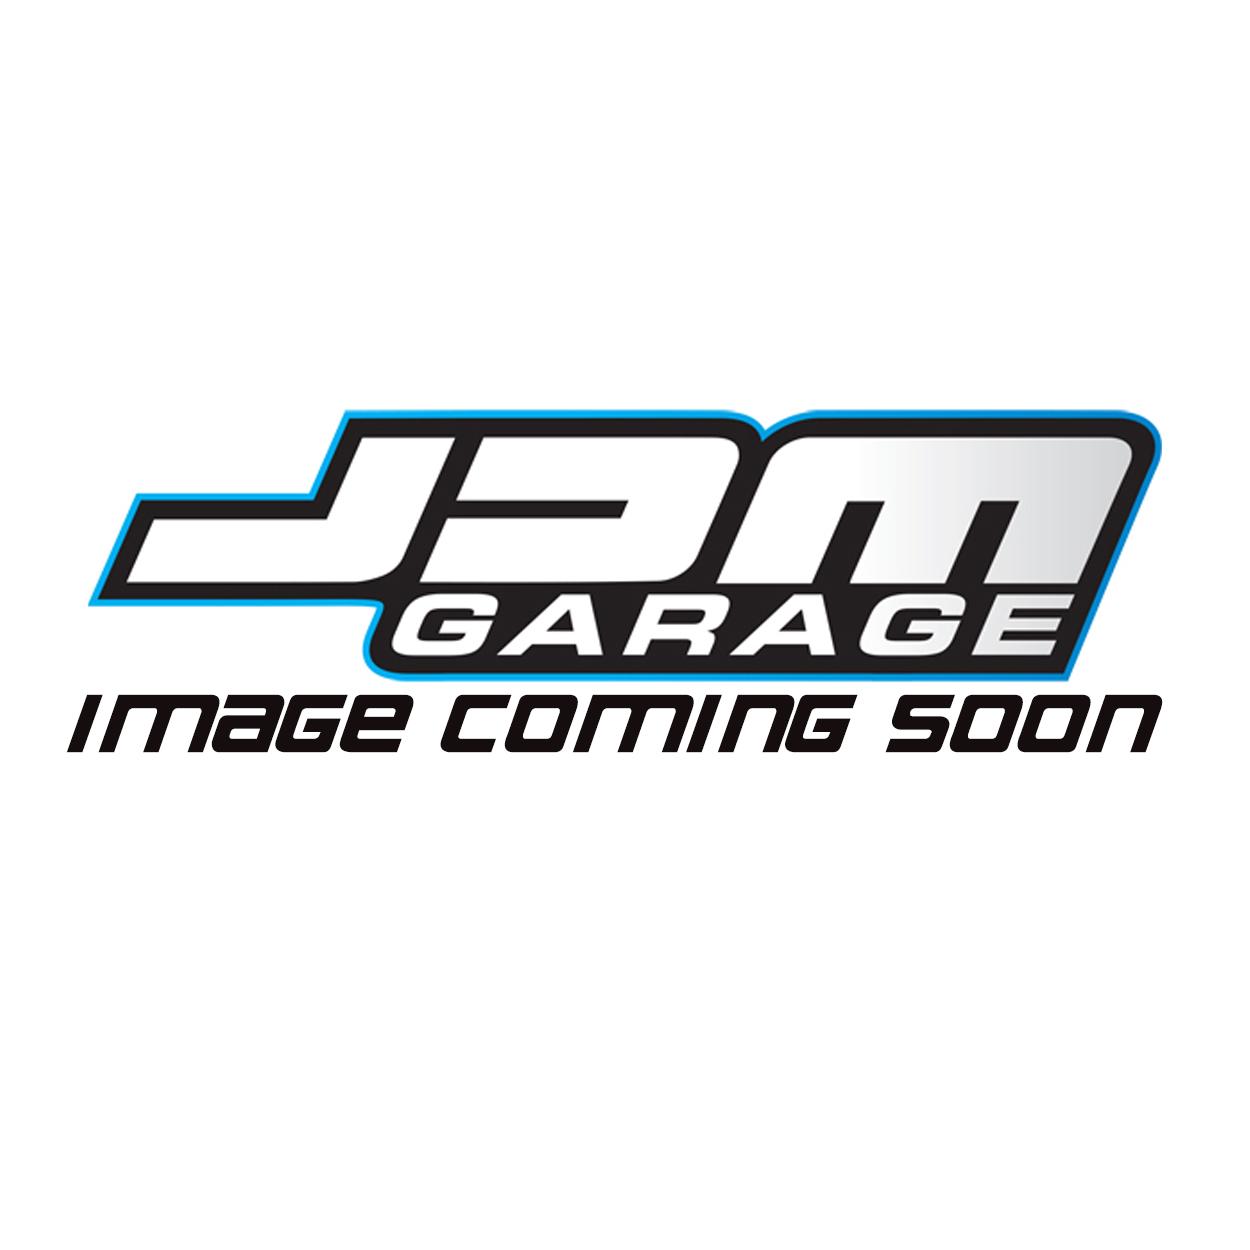 JDM Garage Vintage Trucker Snap Back Cap - White / Blue Mesh